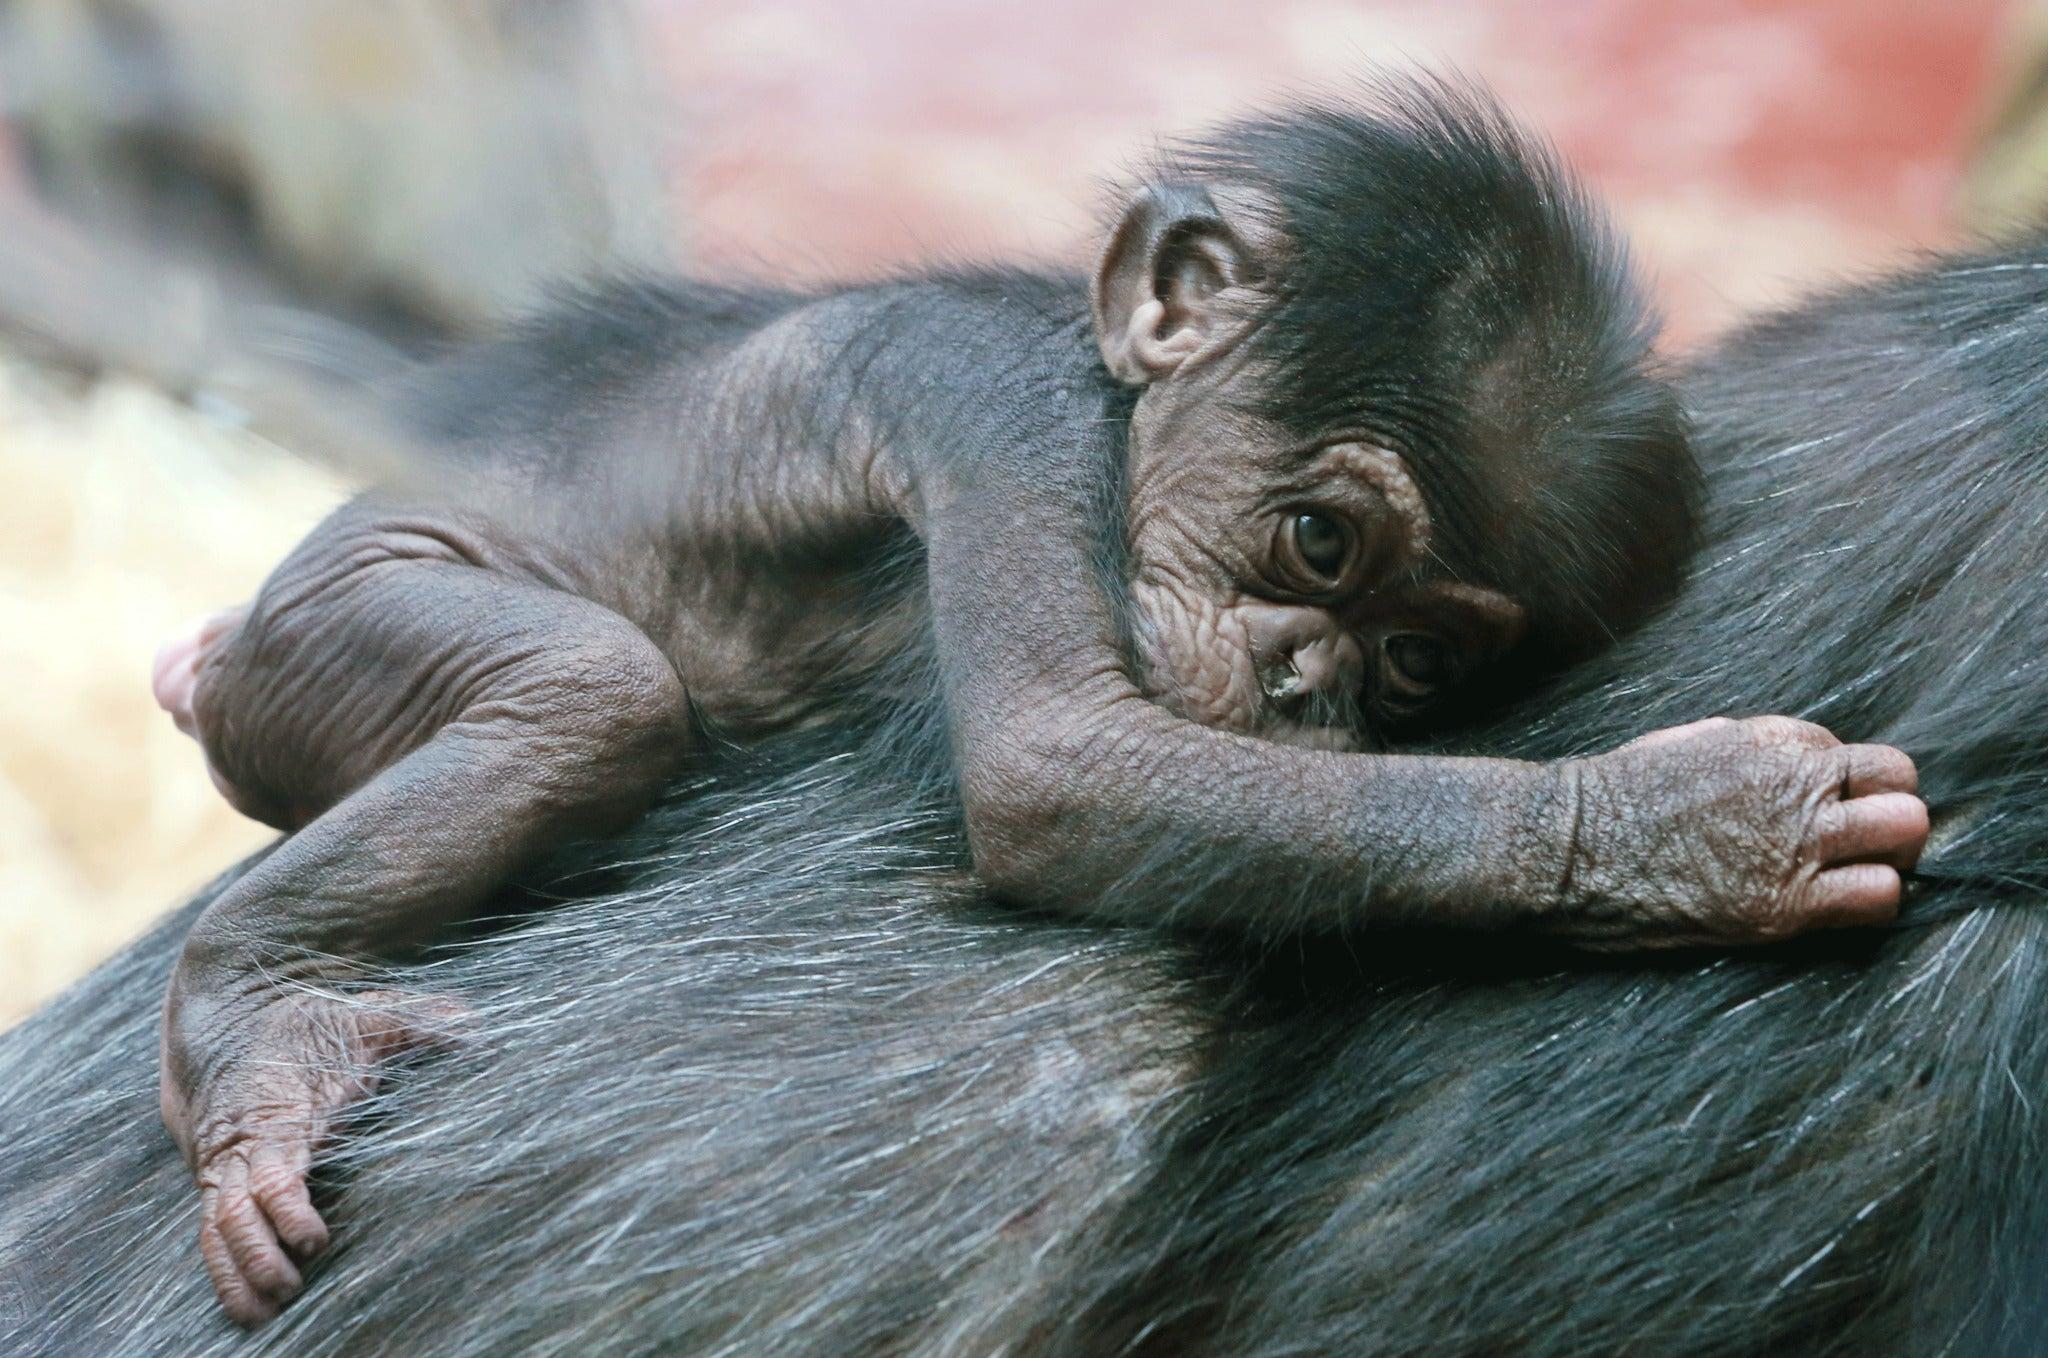 Free Ape Sex Videos chimpanzees may have a similar sense of right and wrong to